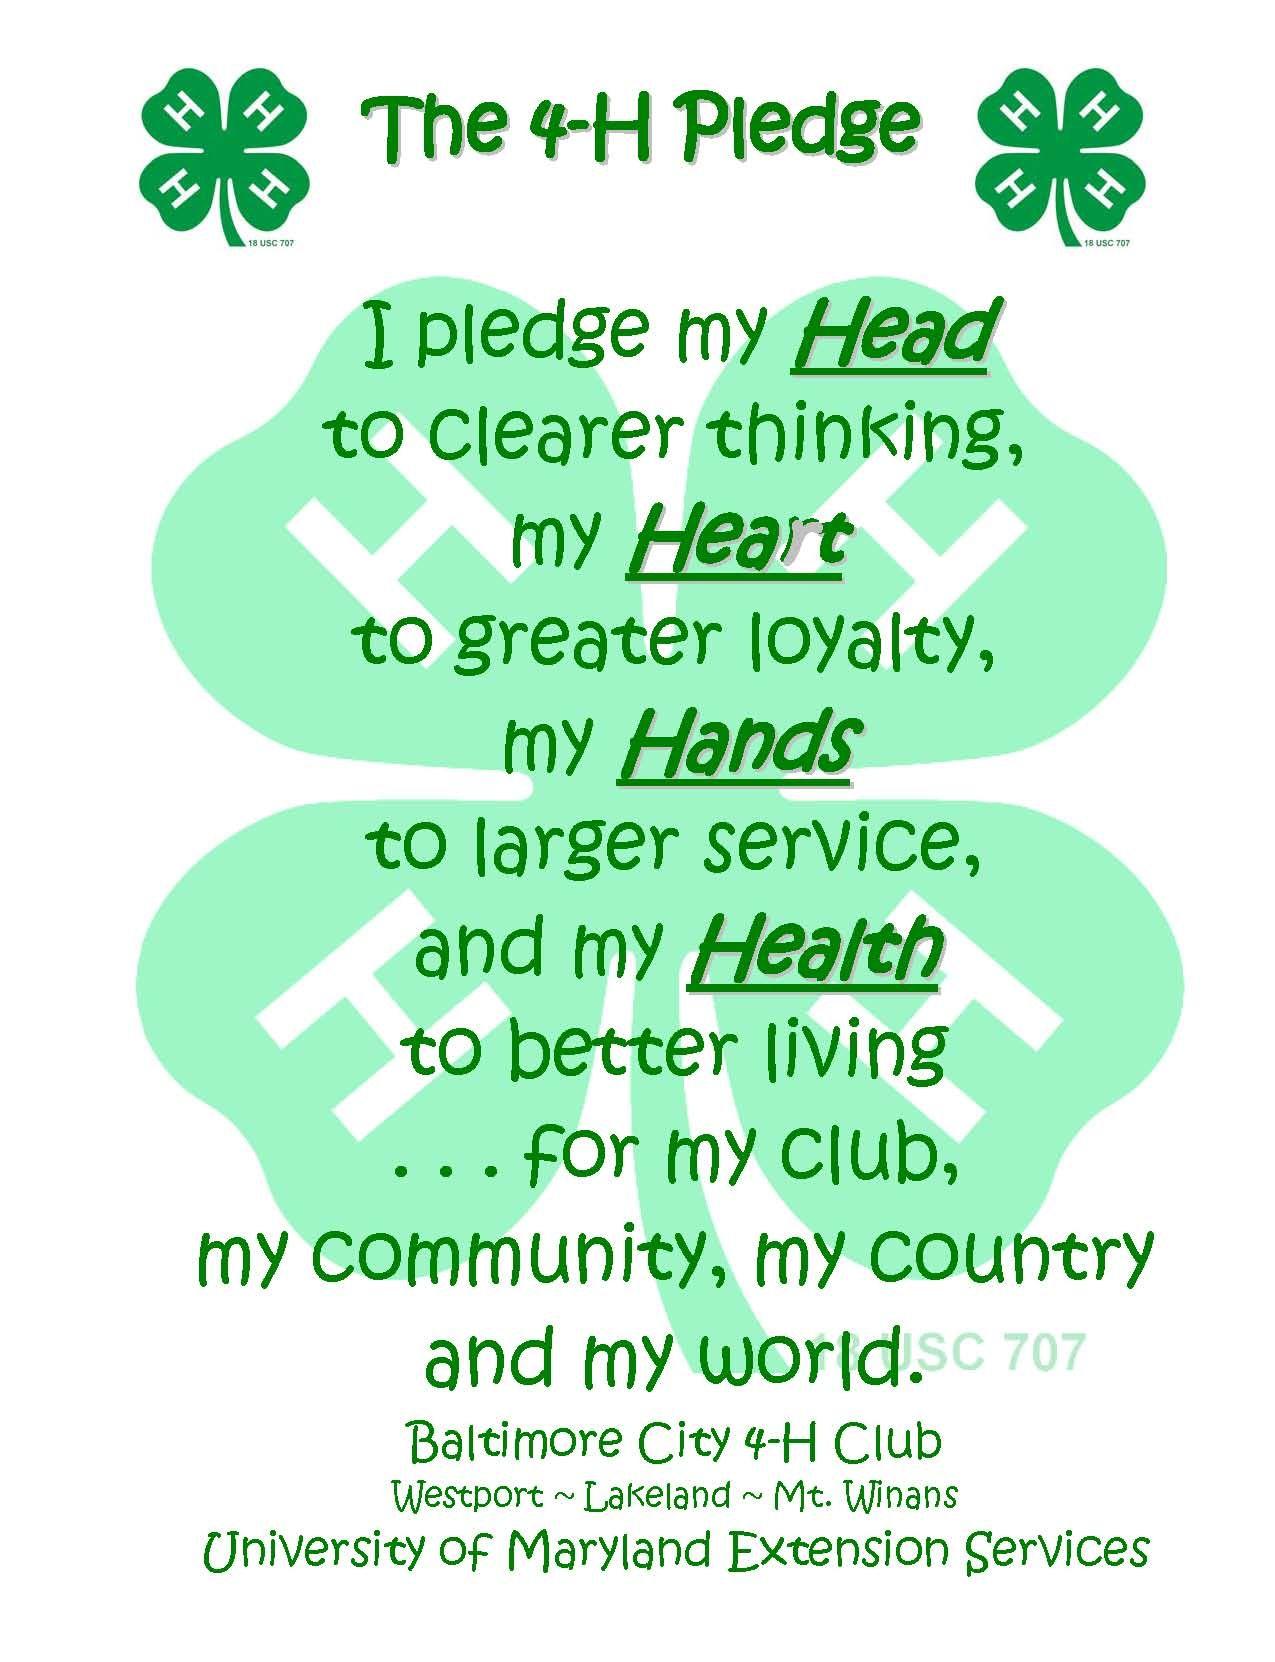 photograph about 4-h Pledge Printable named 4-H Task T.O.O.U.R., Inc. - 4-H Club Humorous 4 h club